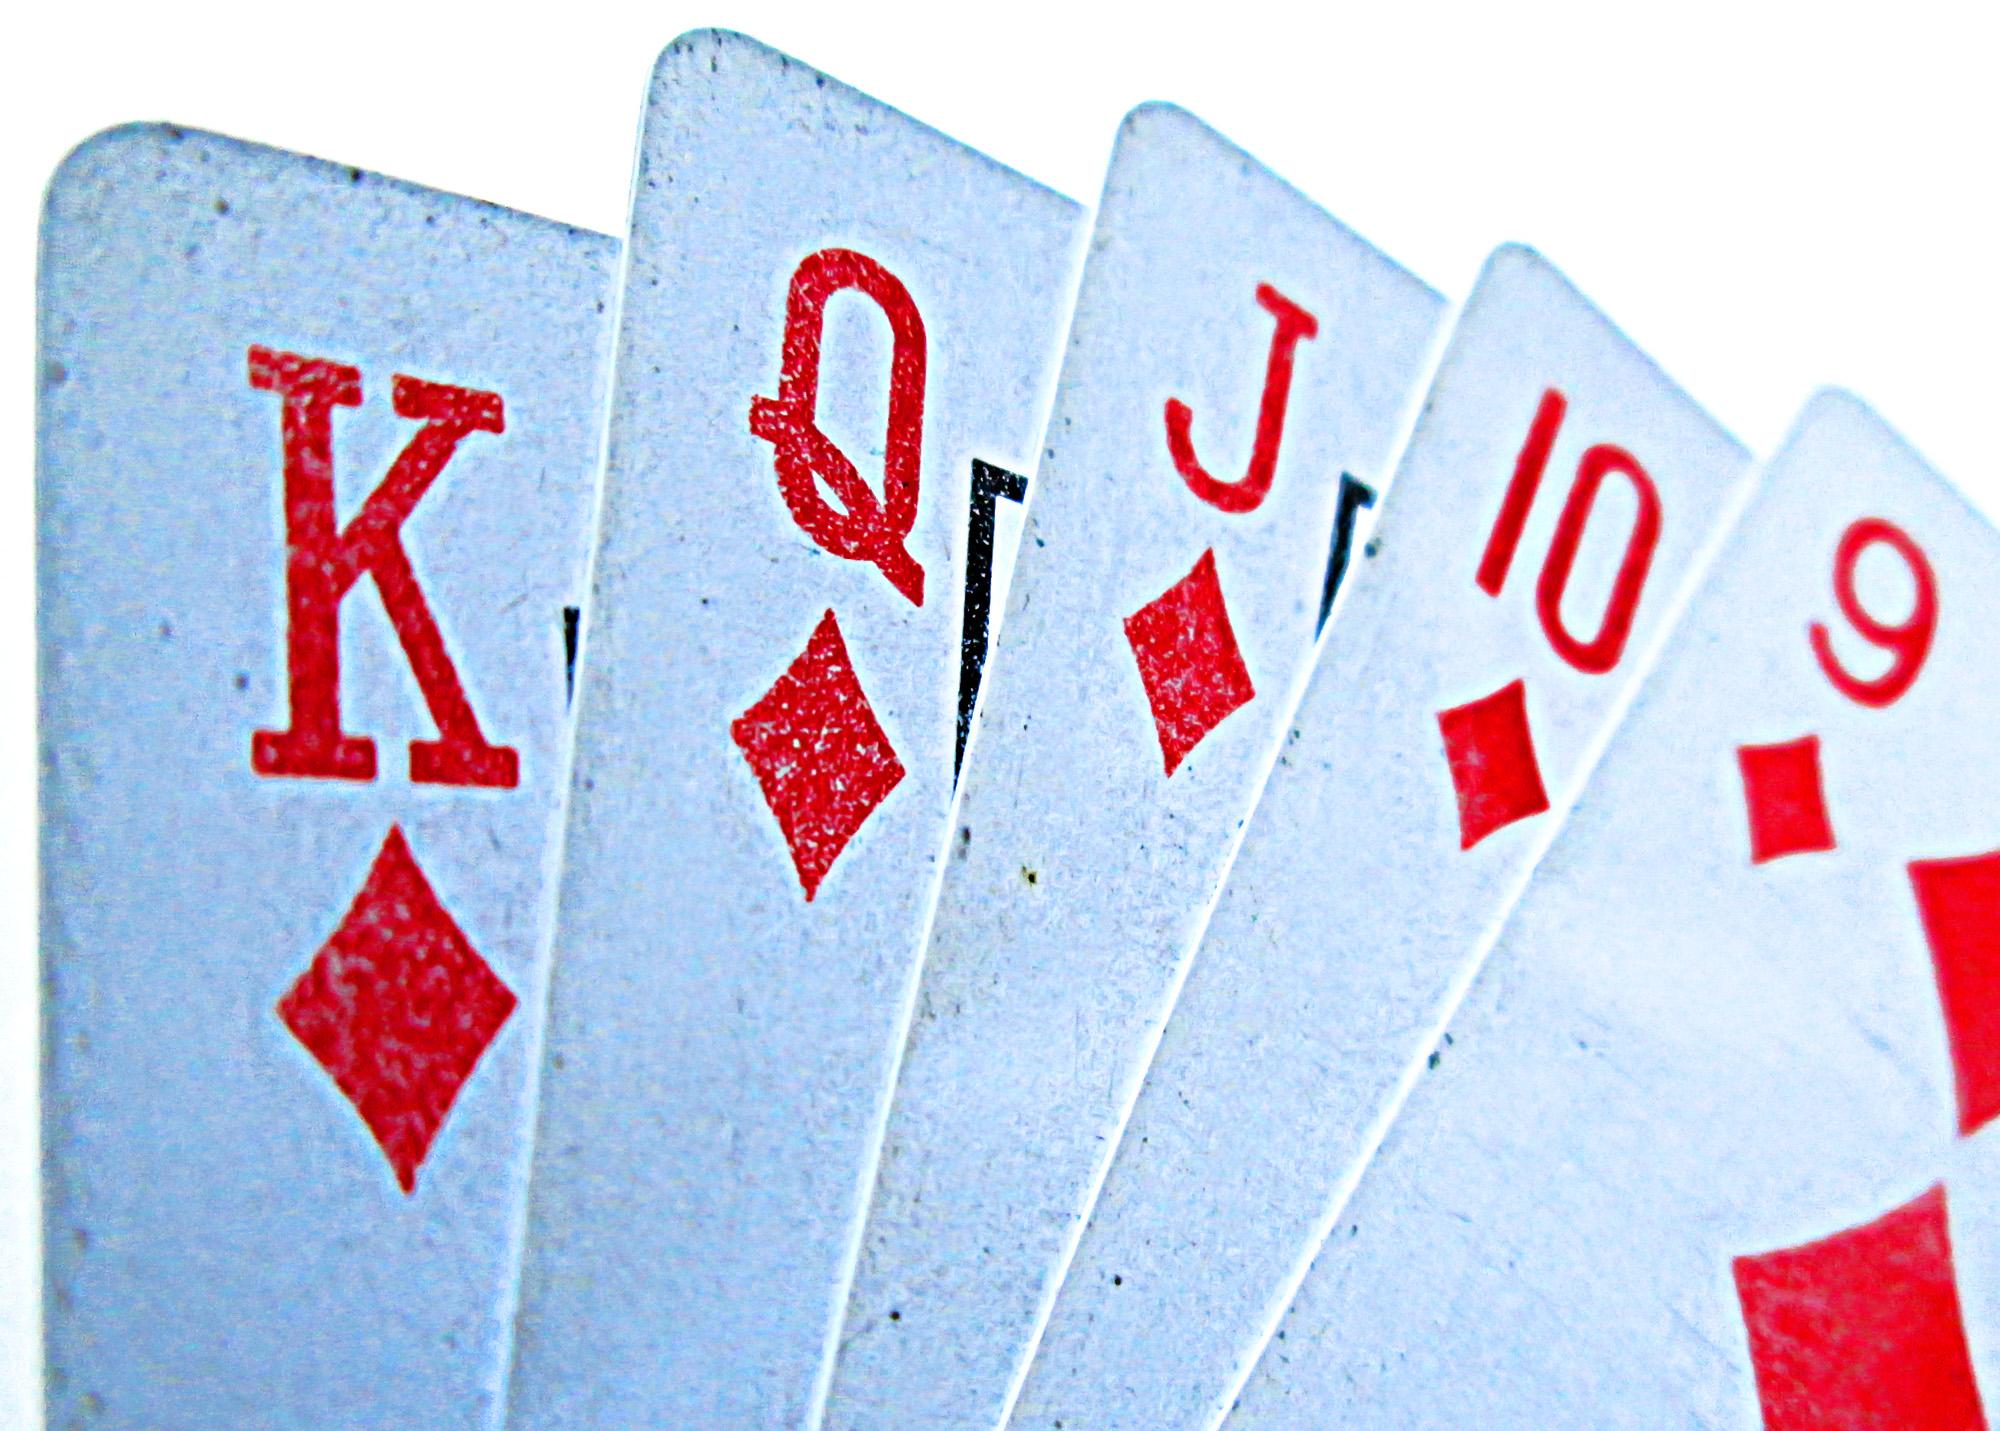 Casino, gambling, gamble or cards photo